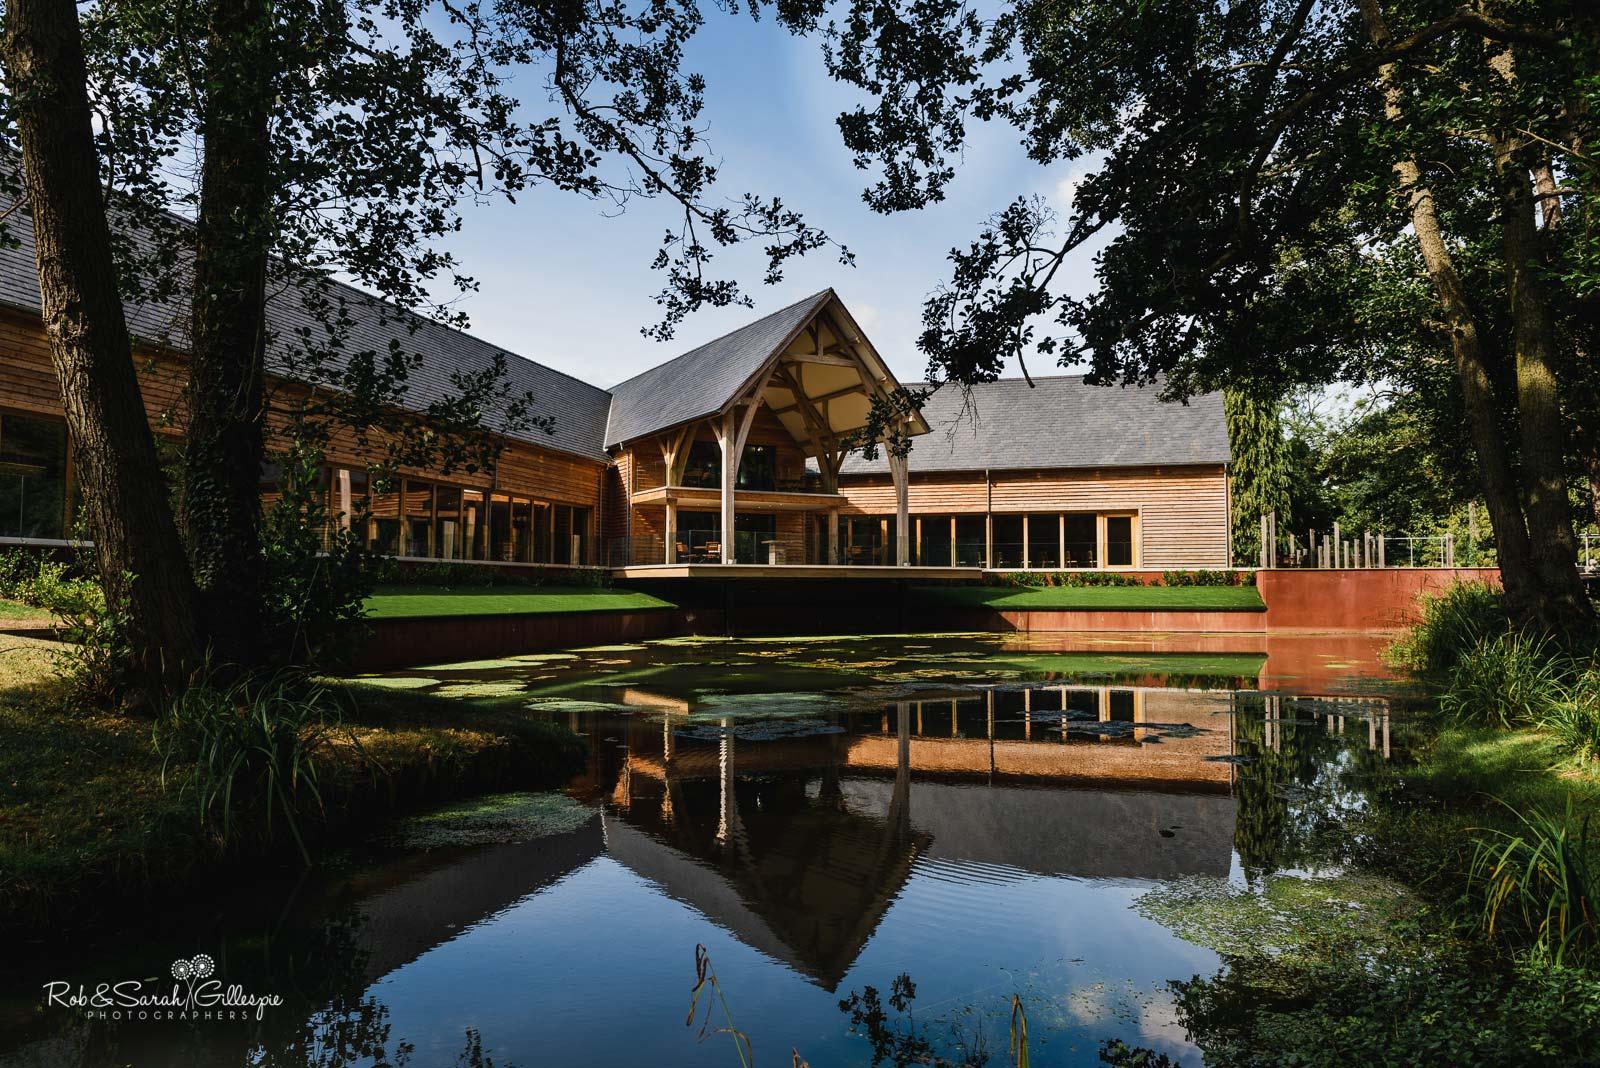 The Mill Barns wedding venue in Shropshire